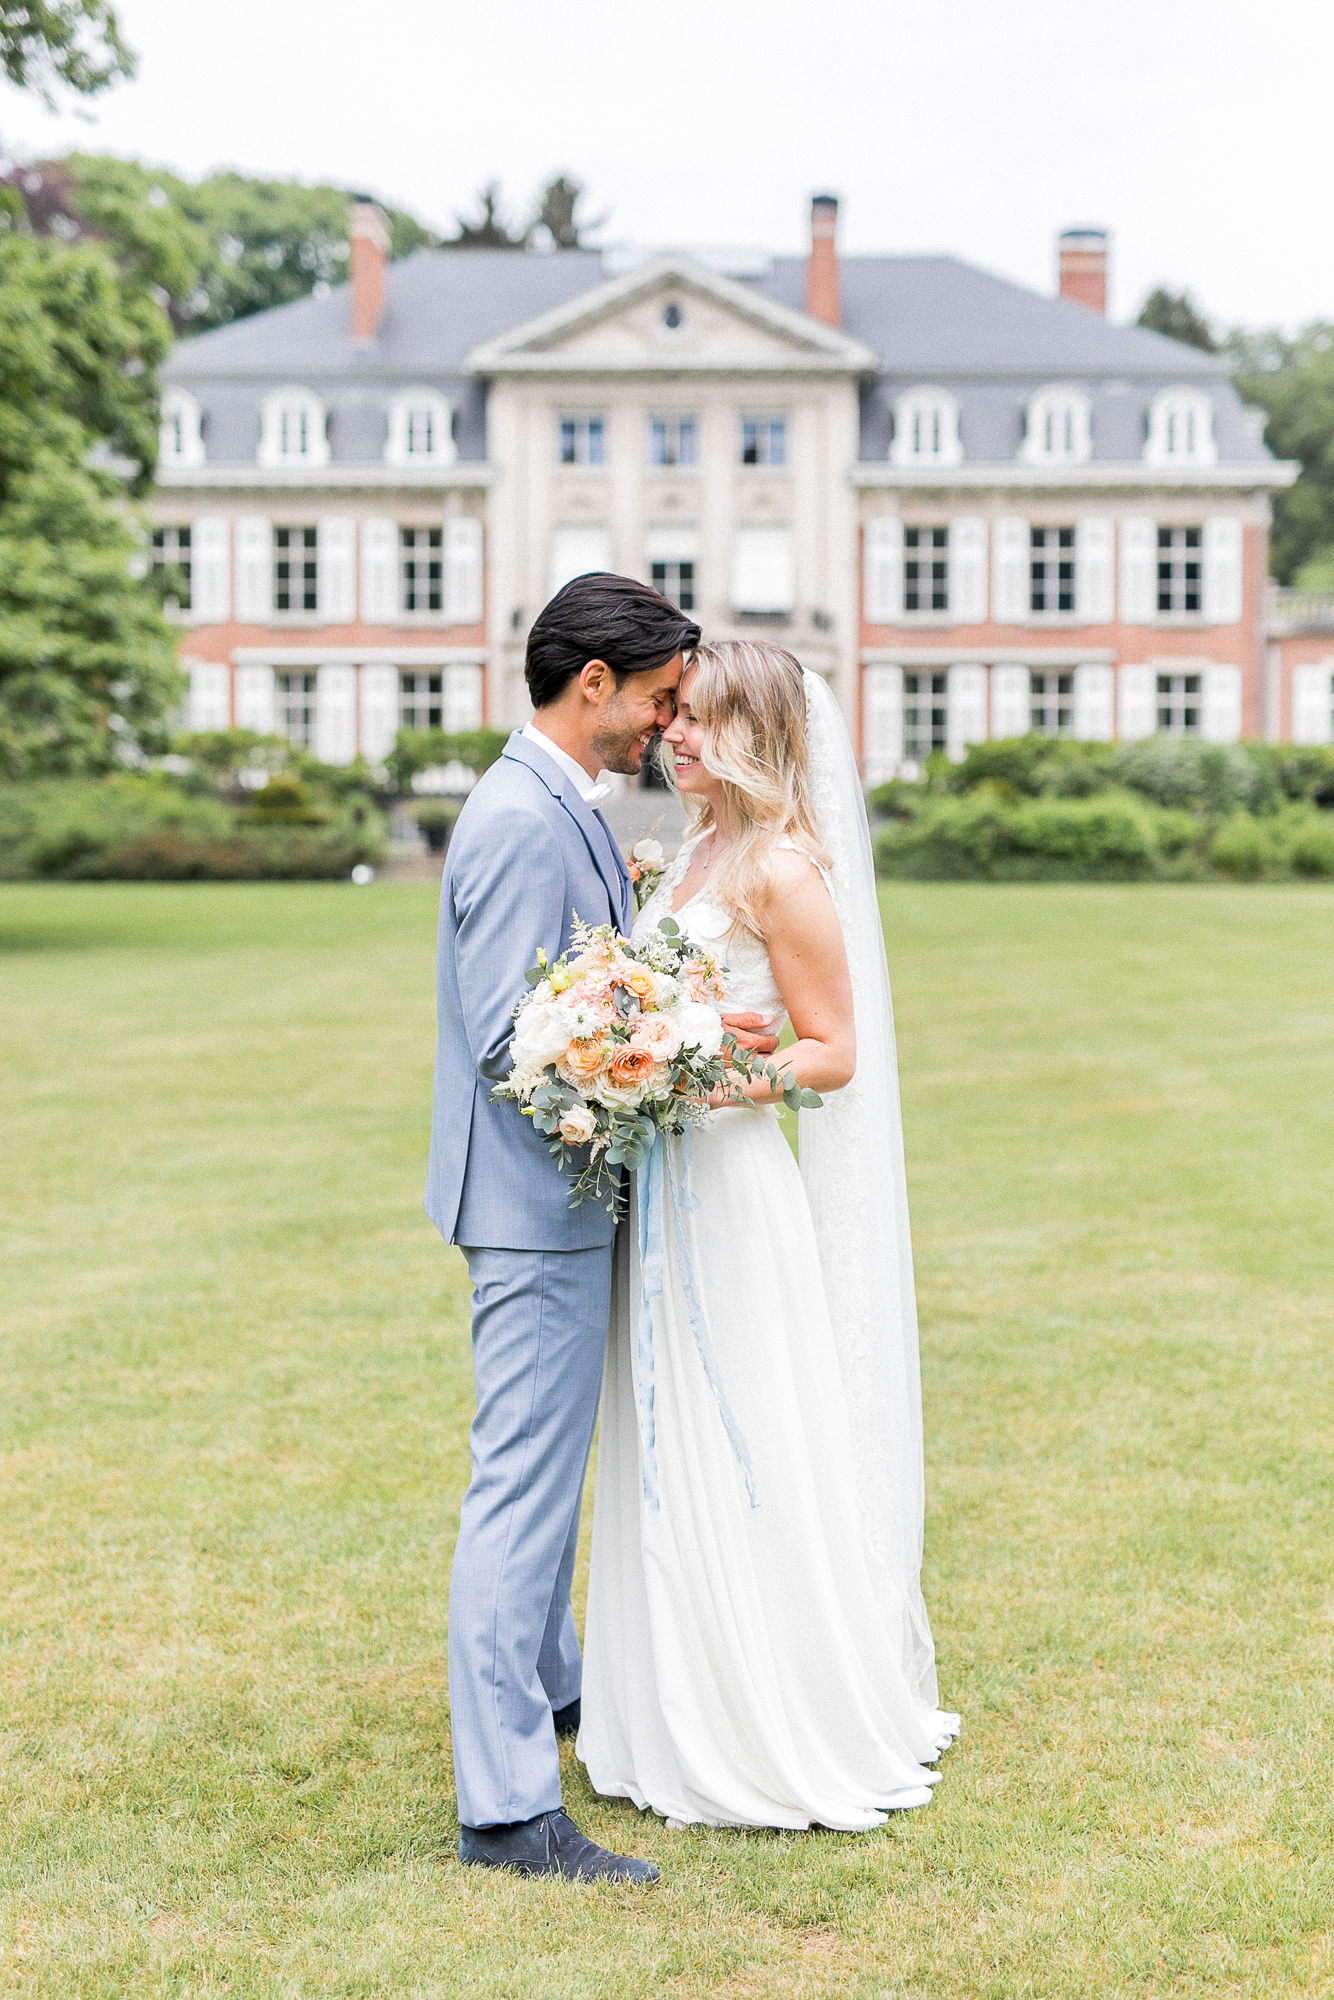 Jasmijn Brussé Fotografie - styled shoot garden wedding-2